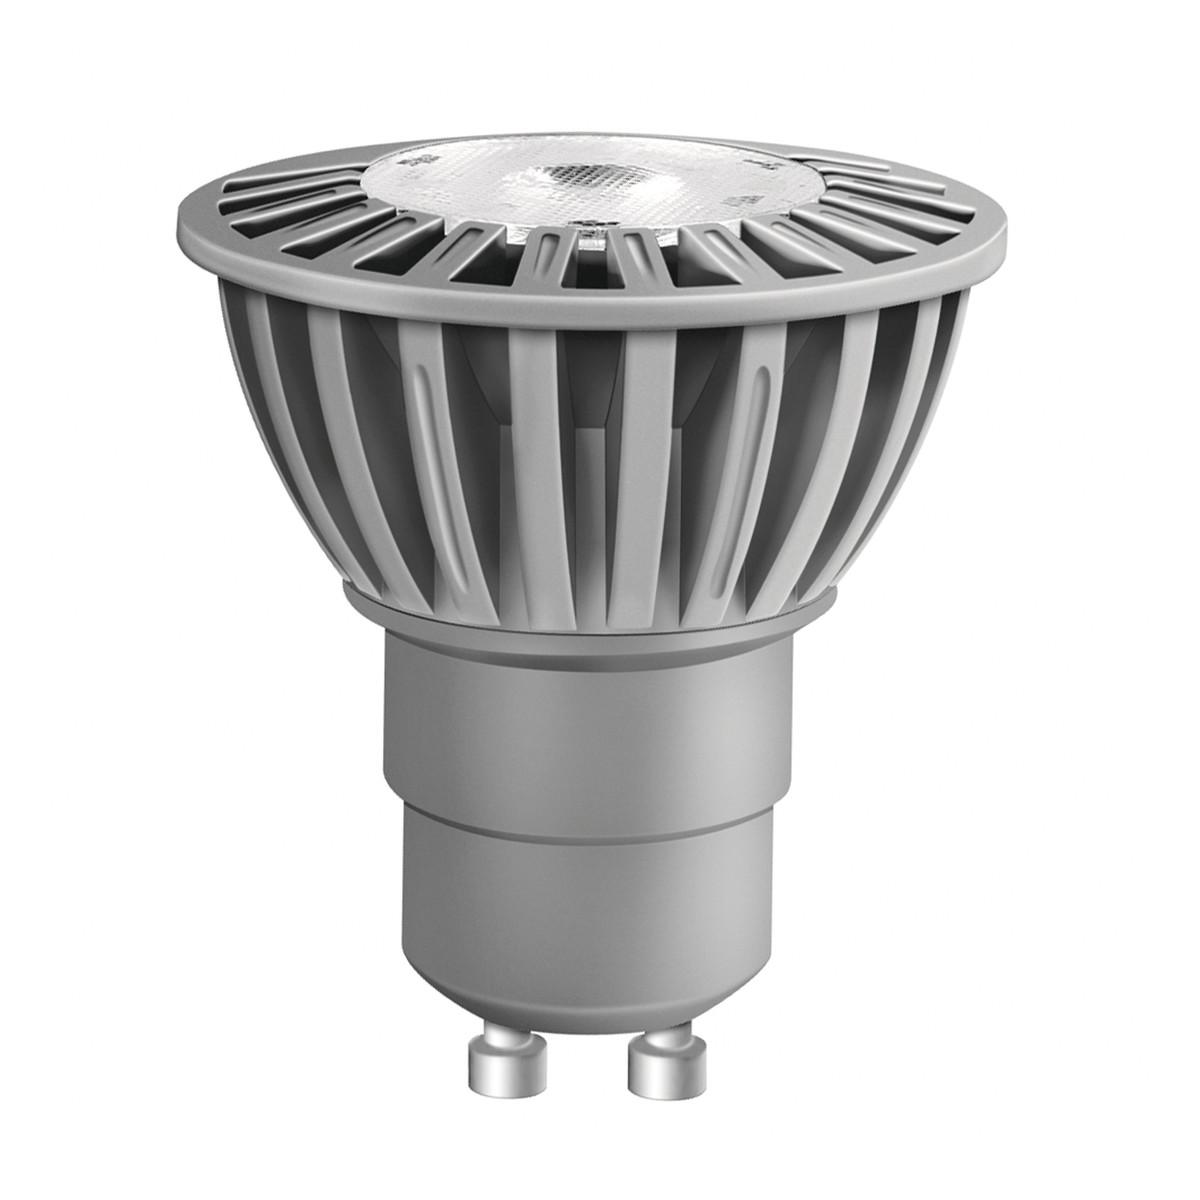 Osram lampadine osram led 4 w prezzo e offerte sottocosto for Catalogo osram led